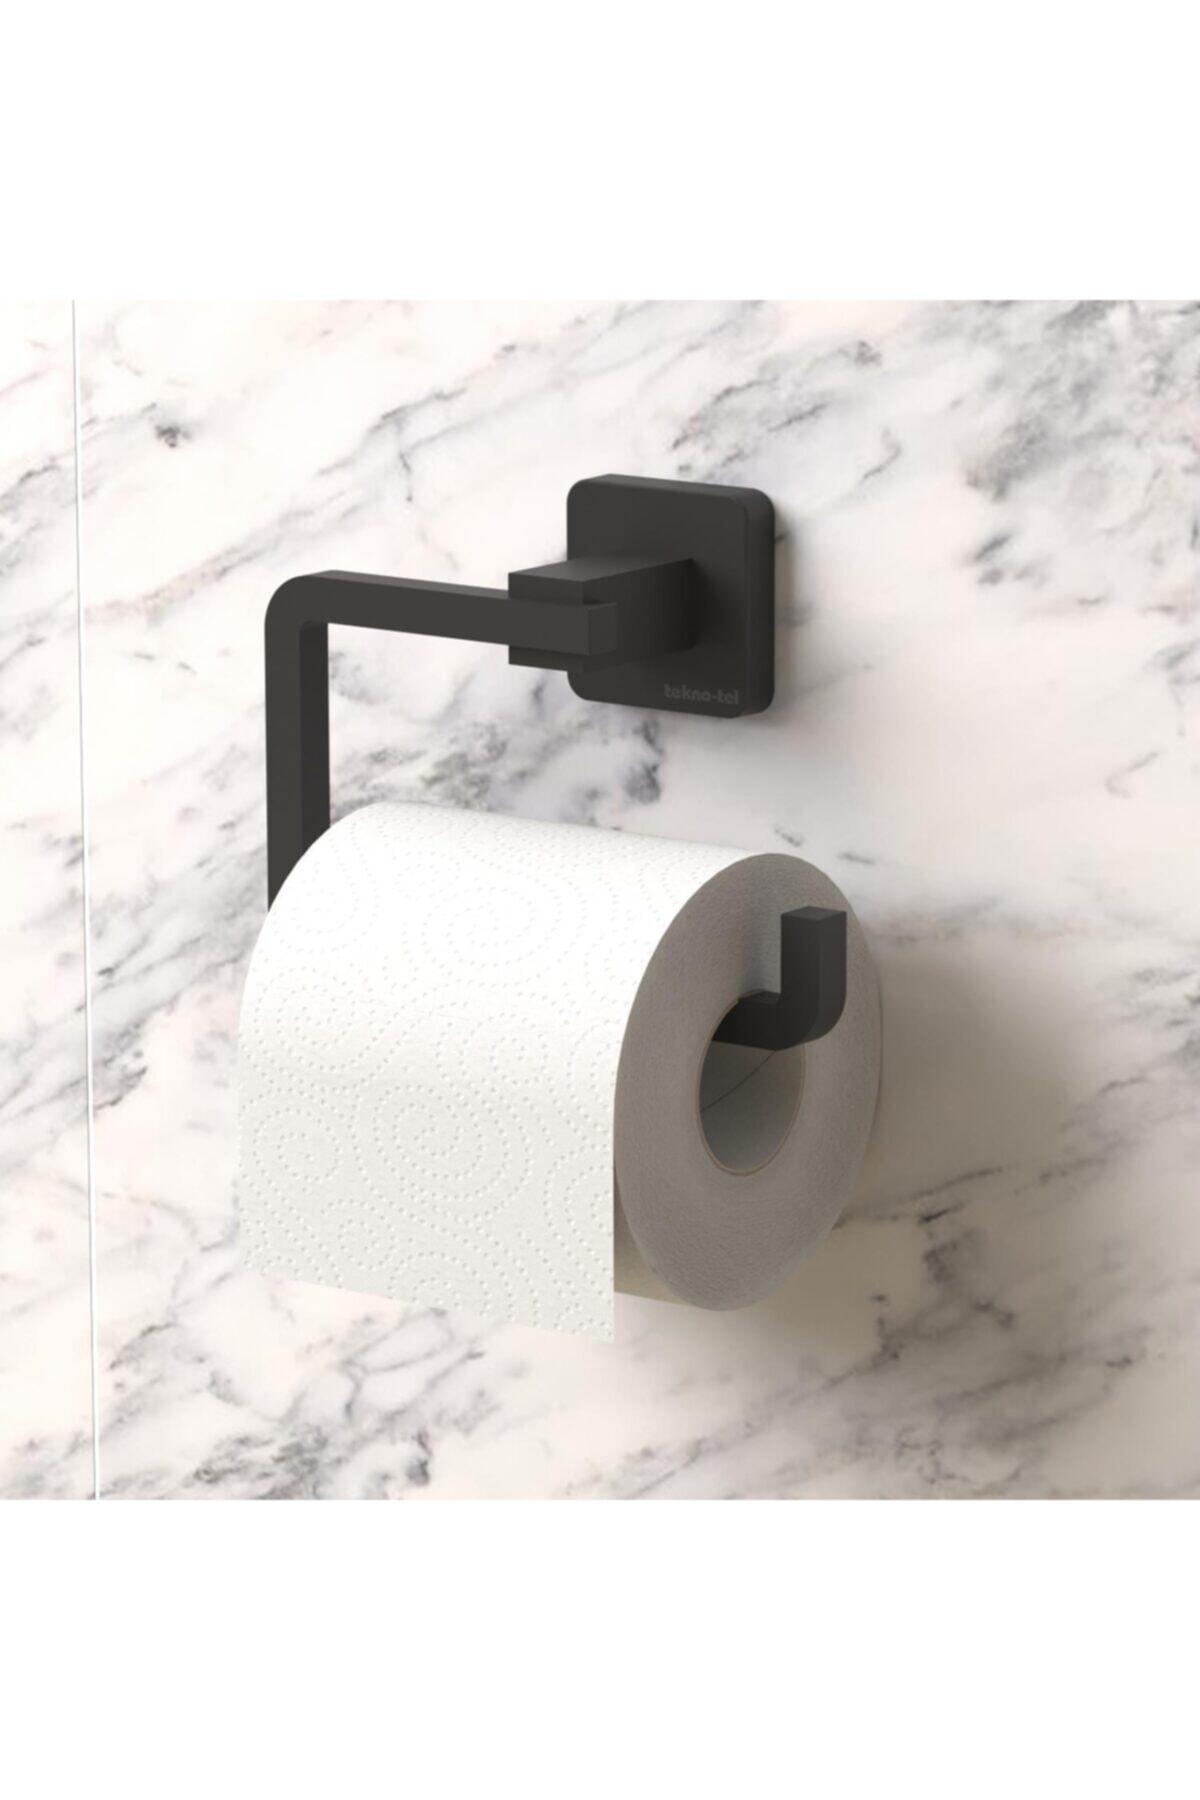 Teknotel Ömür Boyu Paslanmaz Tuvalet Kağıtlık Mat Siyah Mg394 2